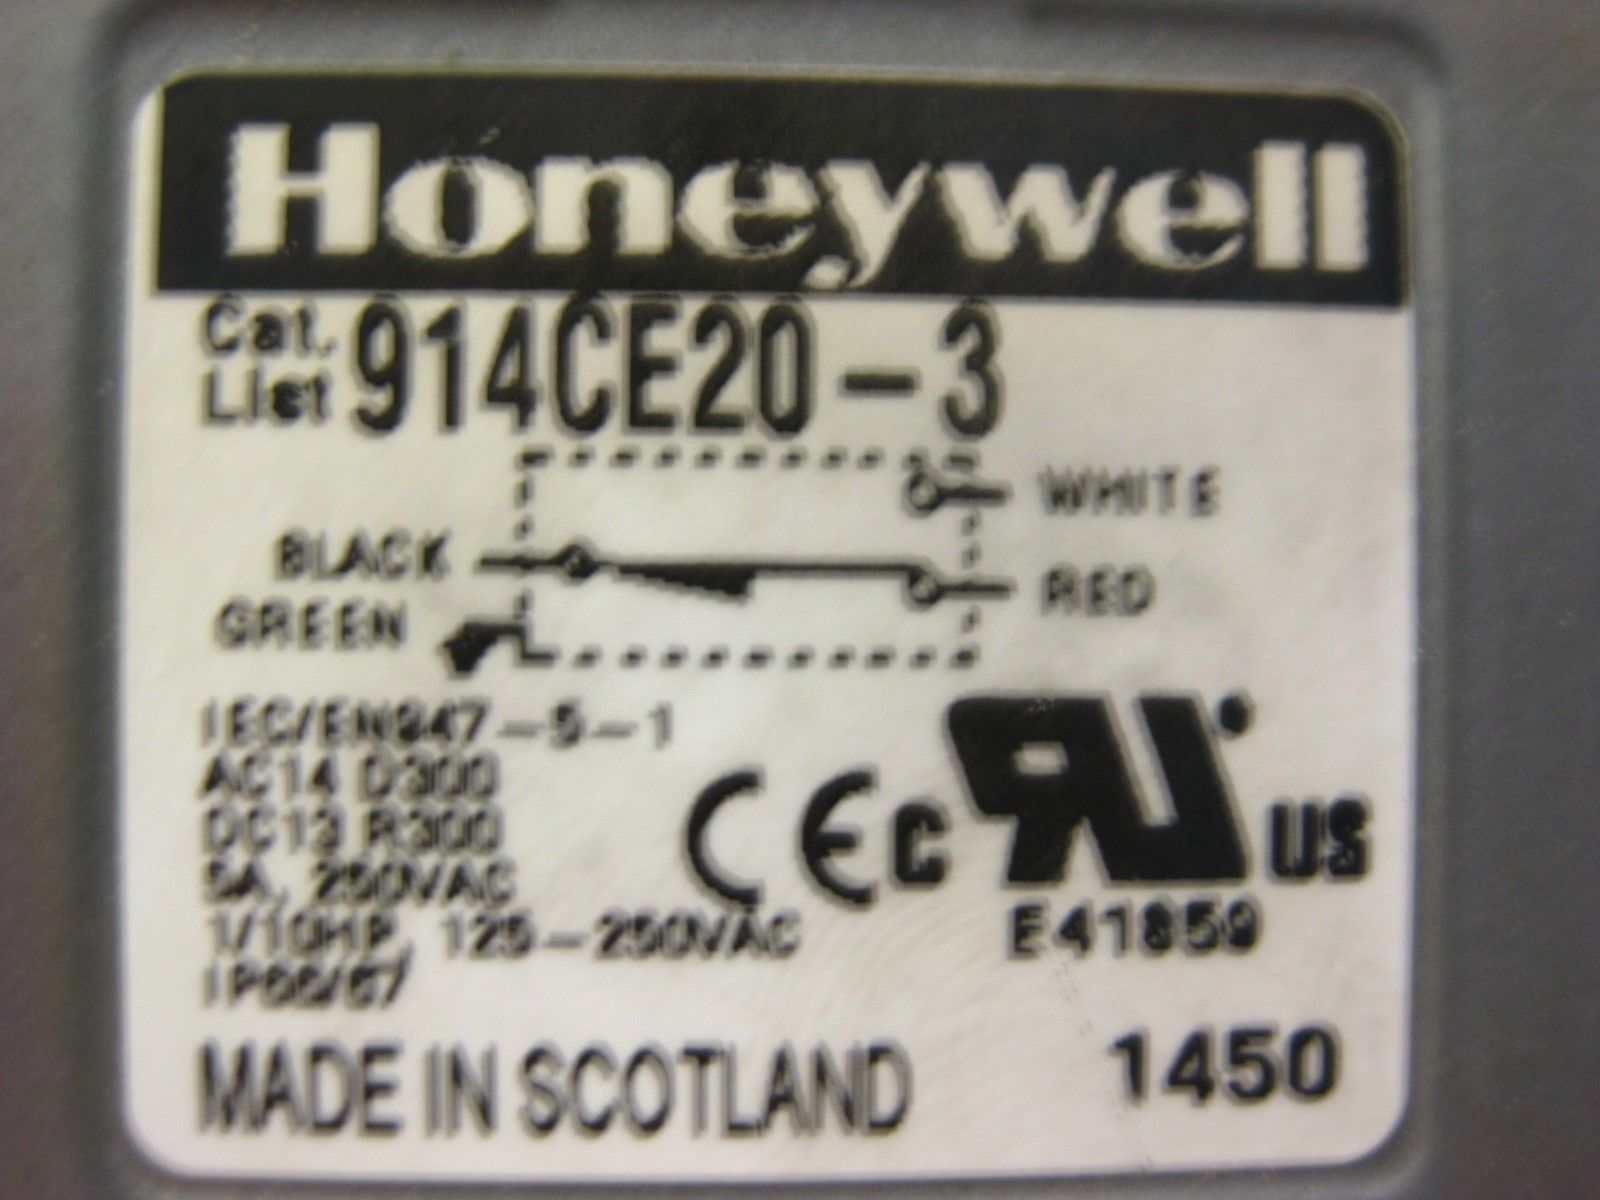 Honeywell Spring Wire Wobble Actuator 914CE20-3 - CNC Parts Dept., Inc.